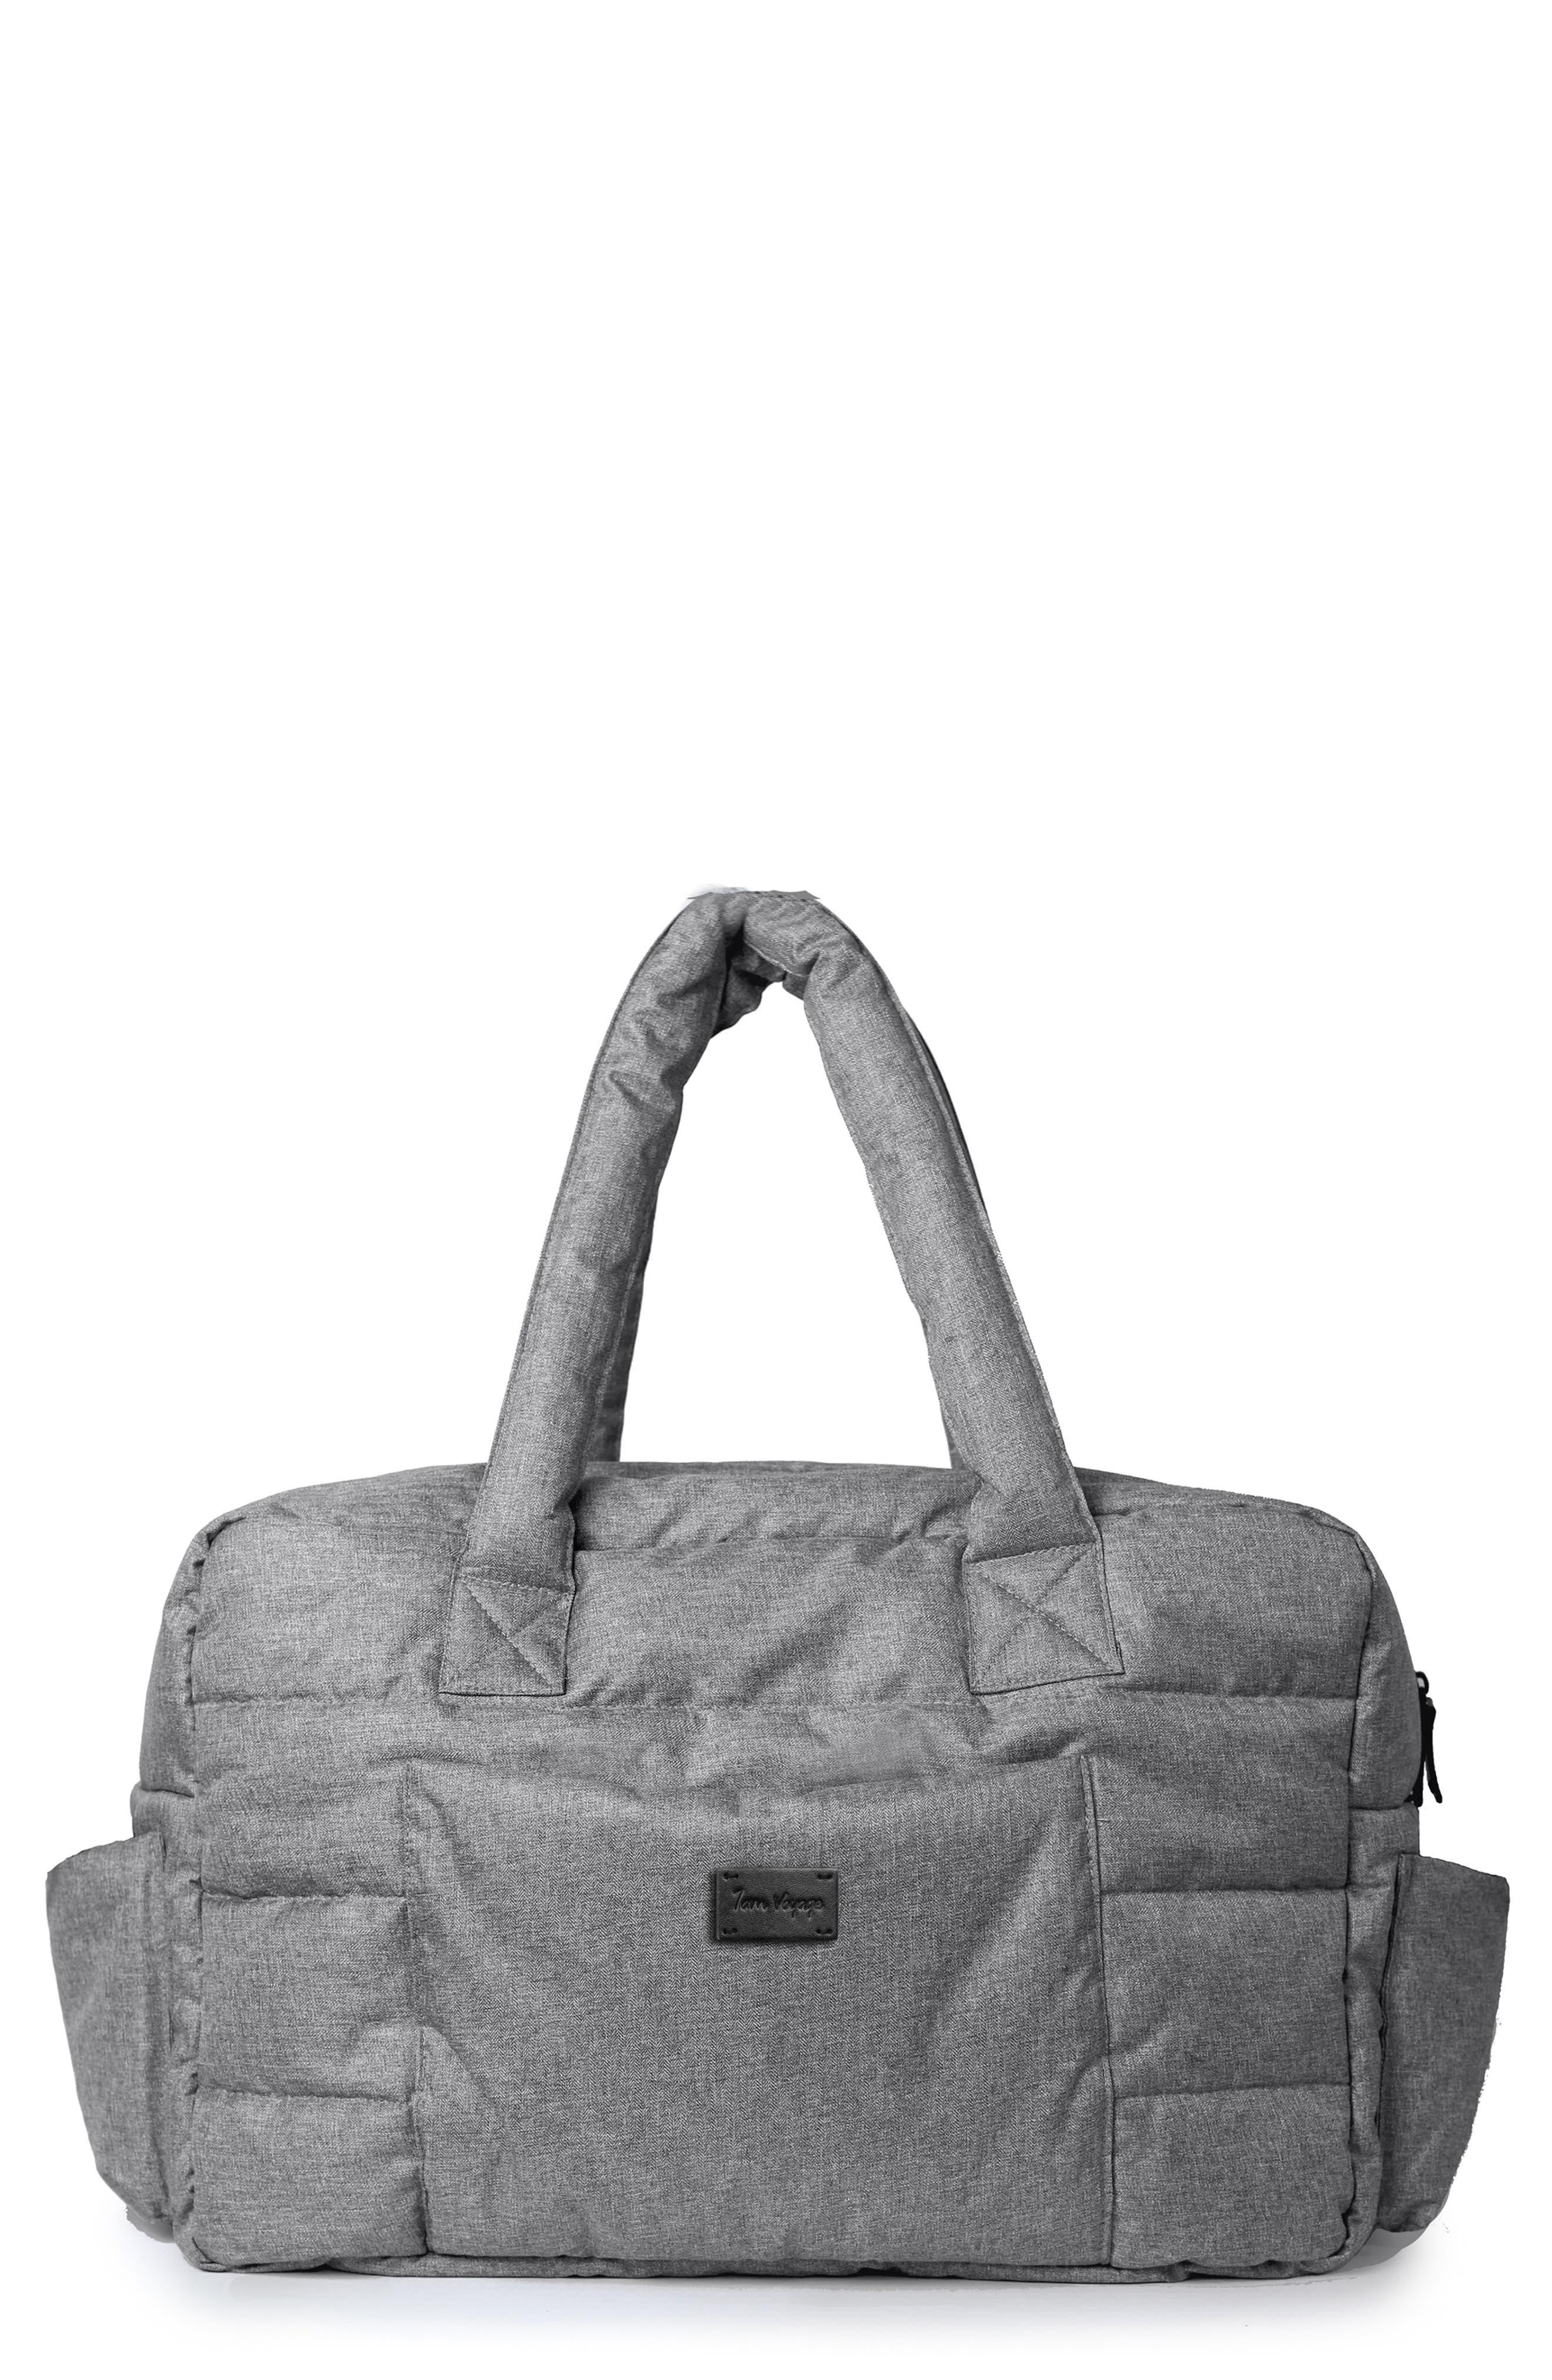 Soho Water Repellent Diaper Bag,                             Main thumbnail 1, color,                             020